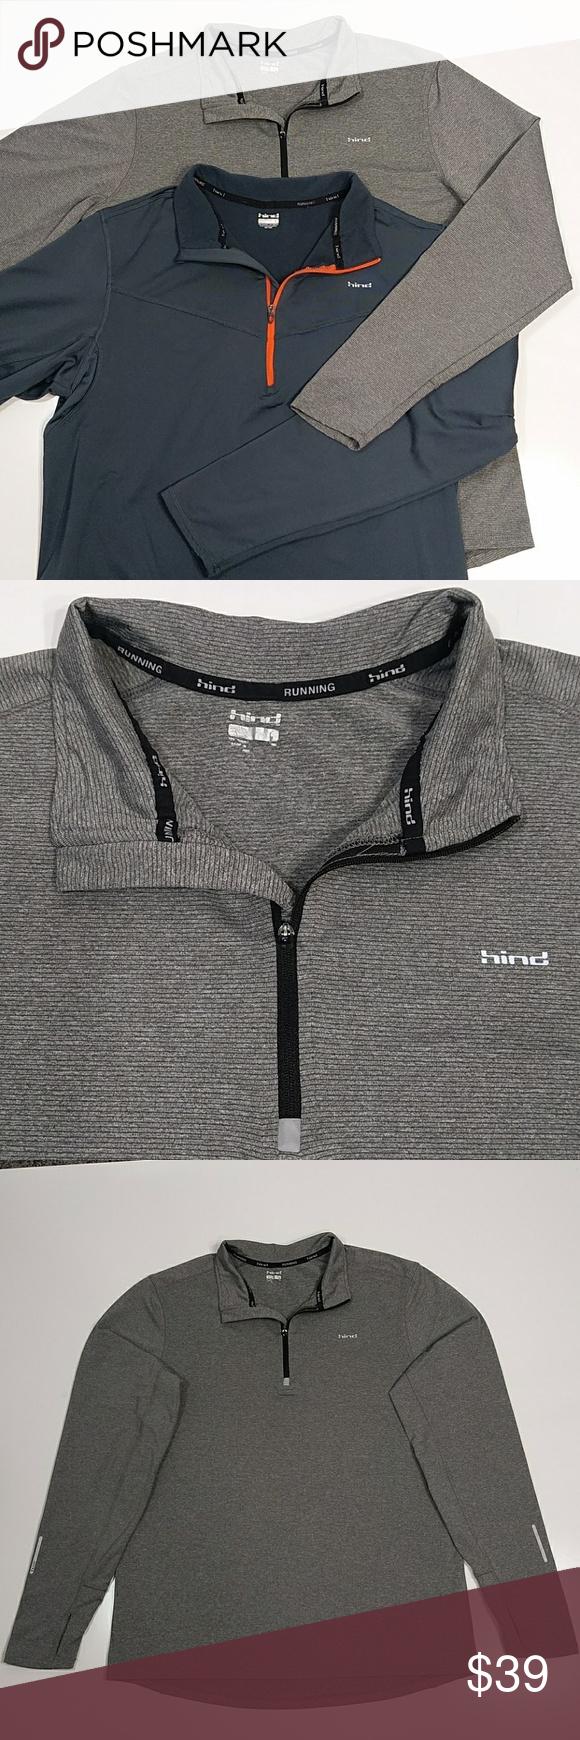 hind hydra running shirt